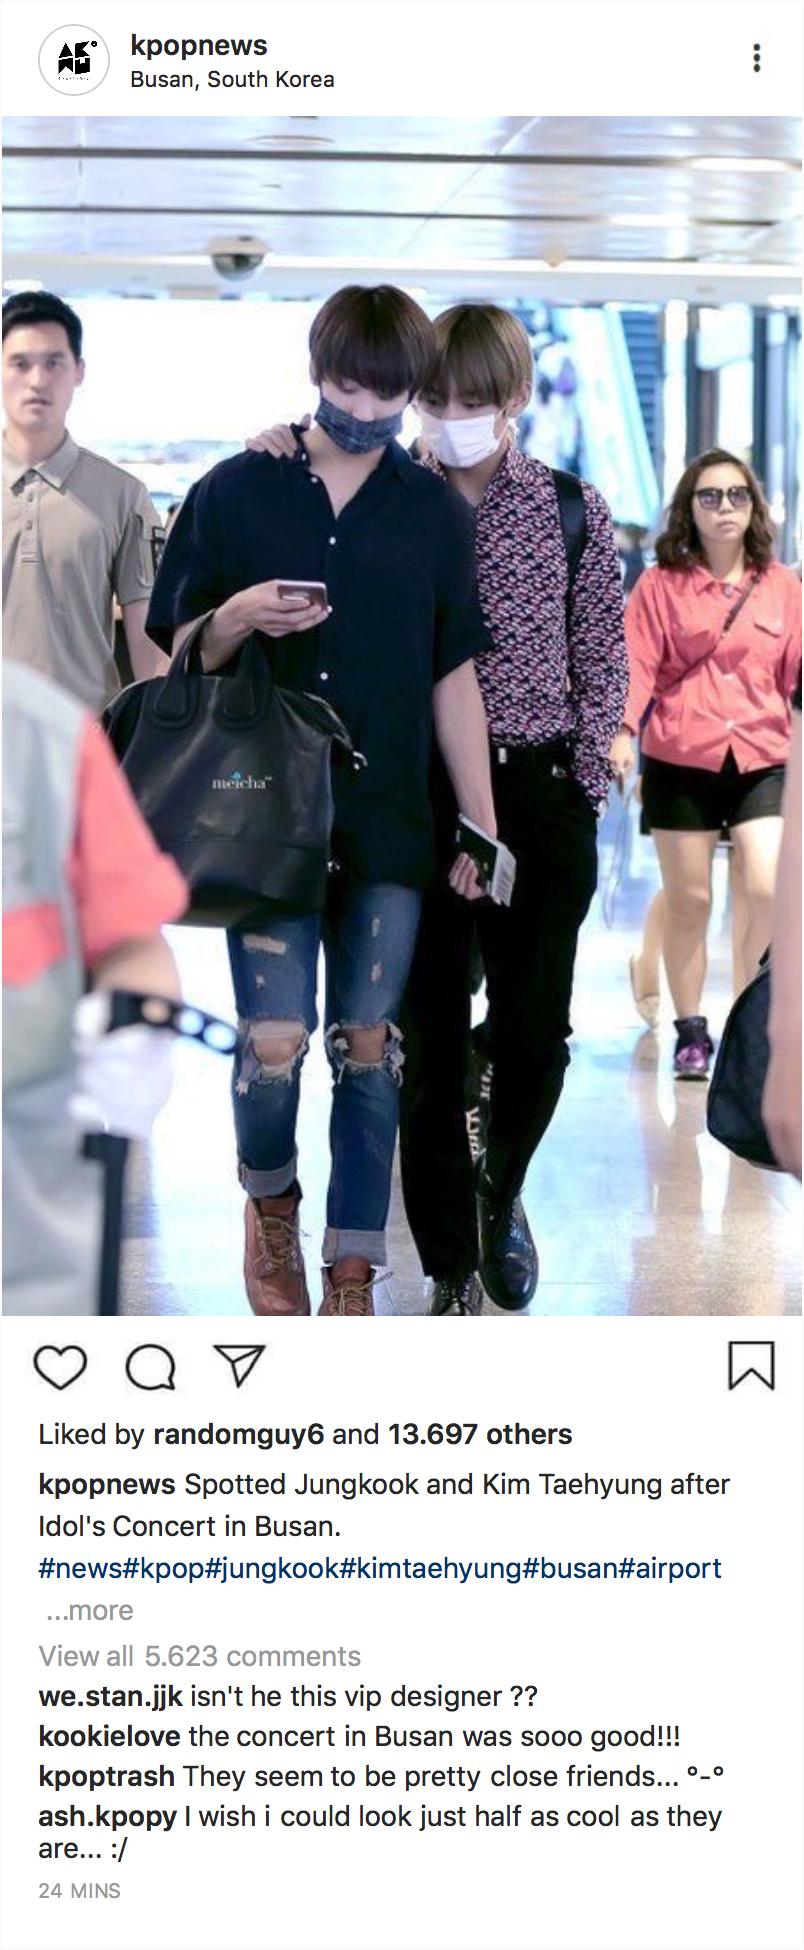 Pin On Fake Instagram Posts